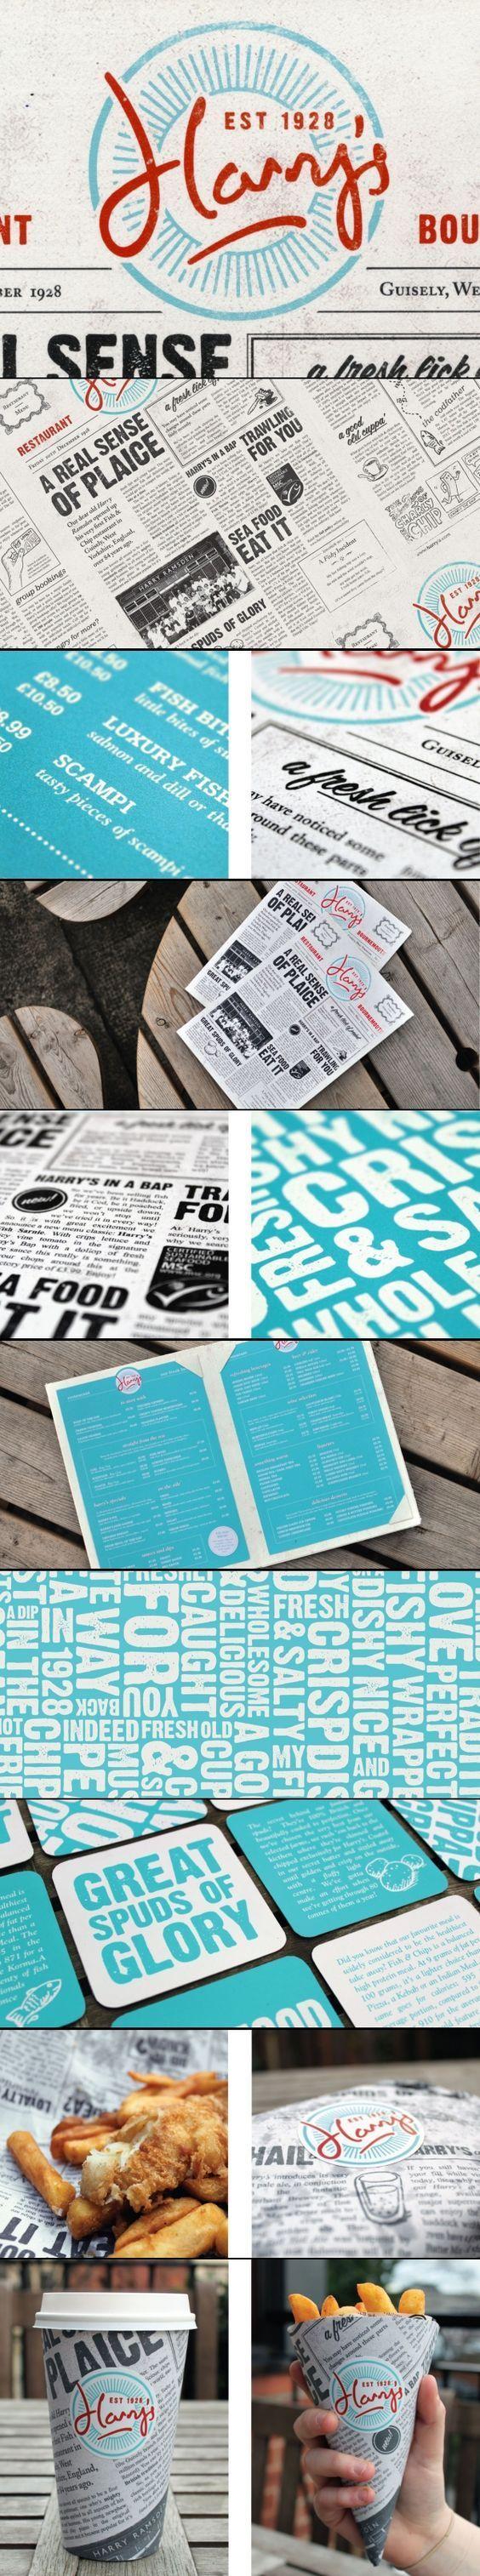 Cassandra cappello graphic design toronto - Harry S Restaurant Branding Fivestar Branding Design And Branding Agency Inspiration Gallery